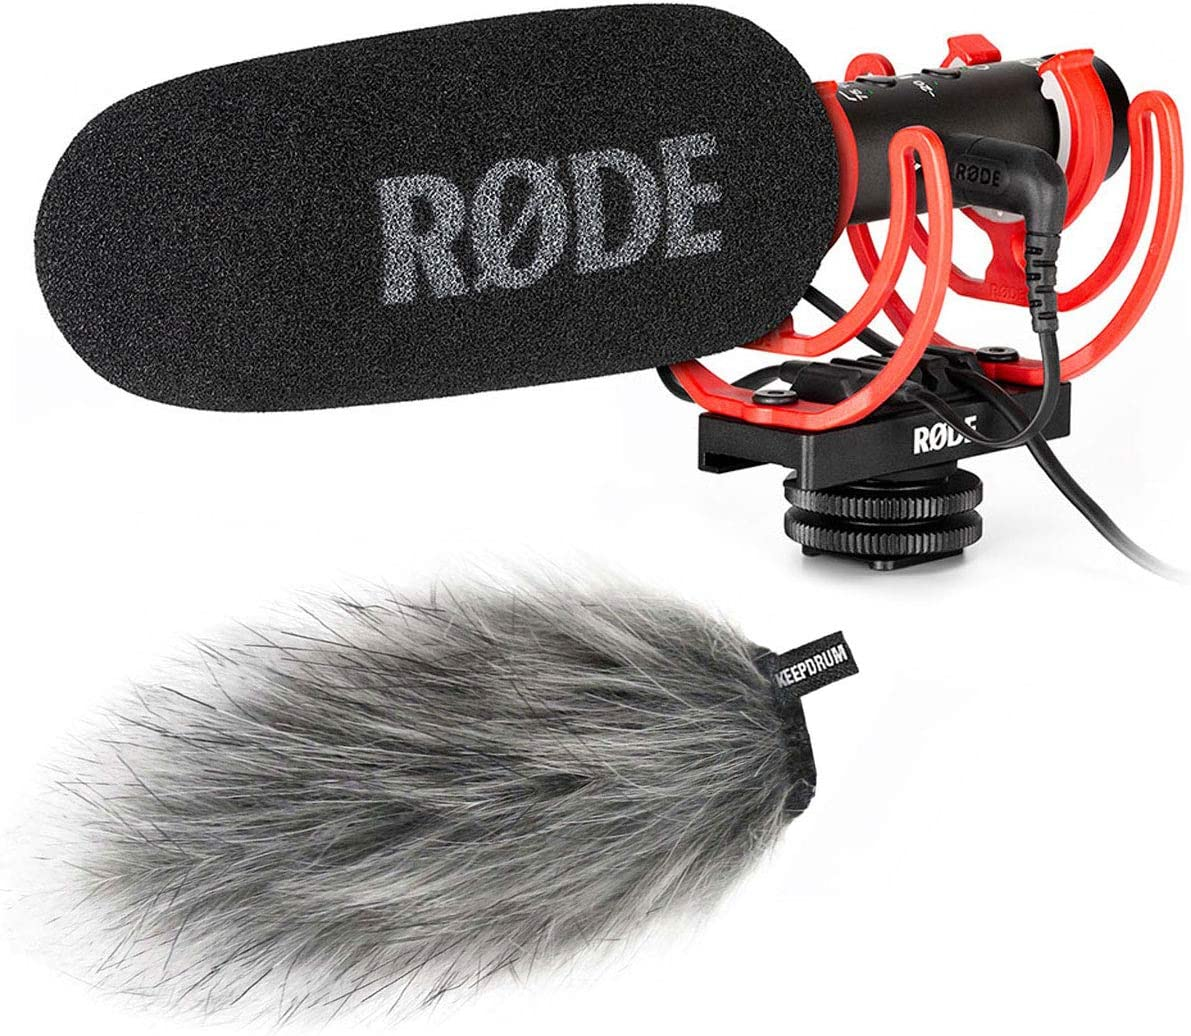 Rode Videomic Ntg Broadcast Kamera Mikrofon Keepdrum Elektronik